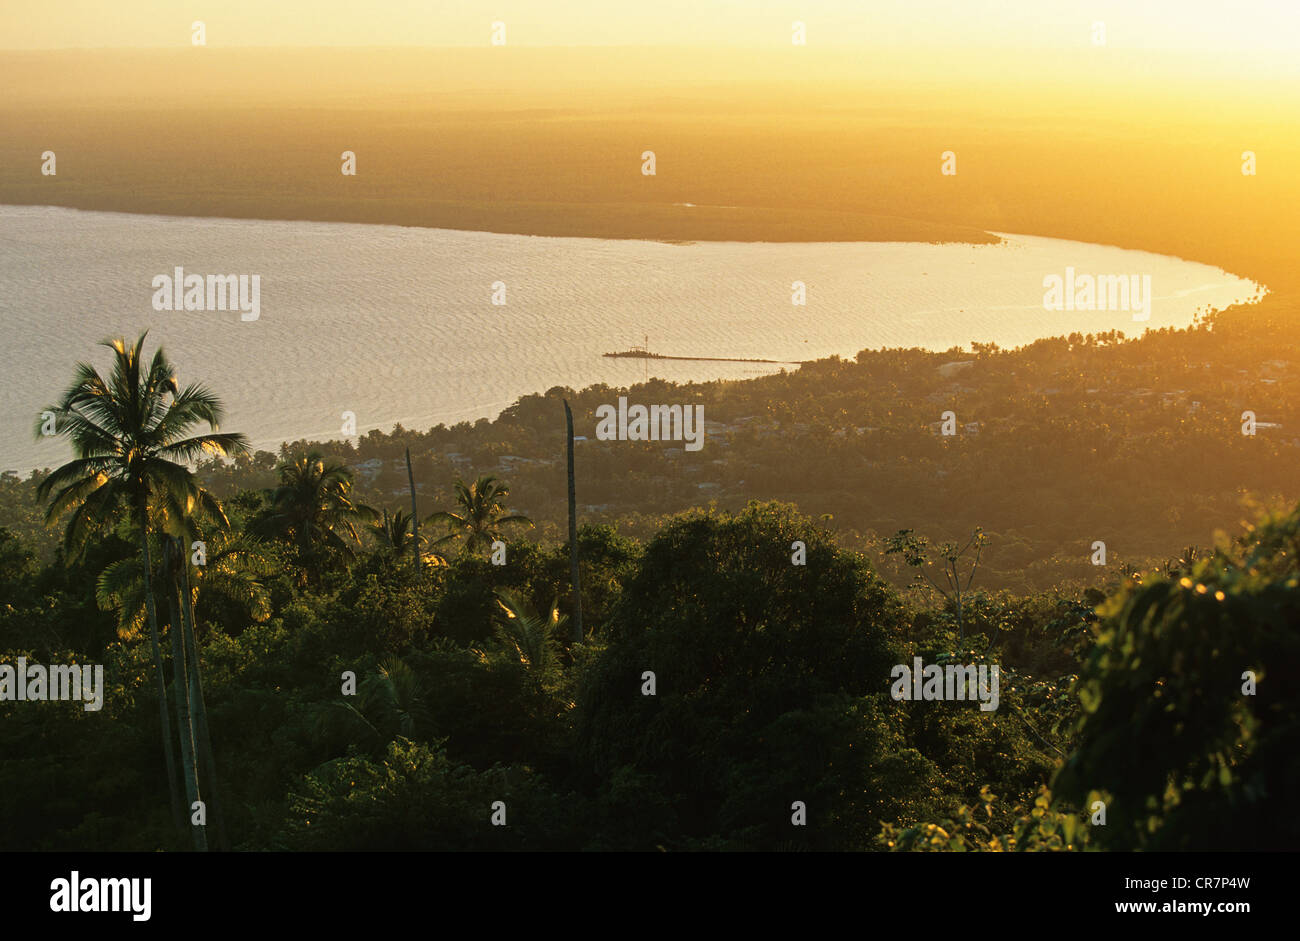 Dominican Republic, Samana Peninsula, Sanchez - Stock Image